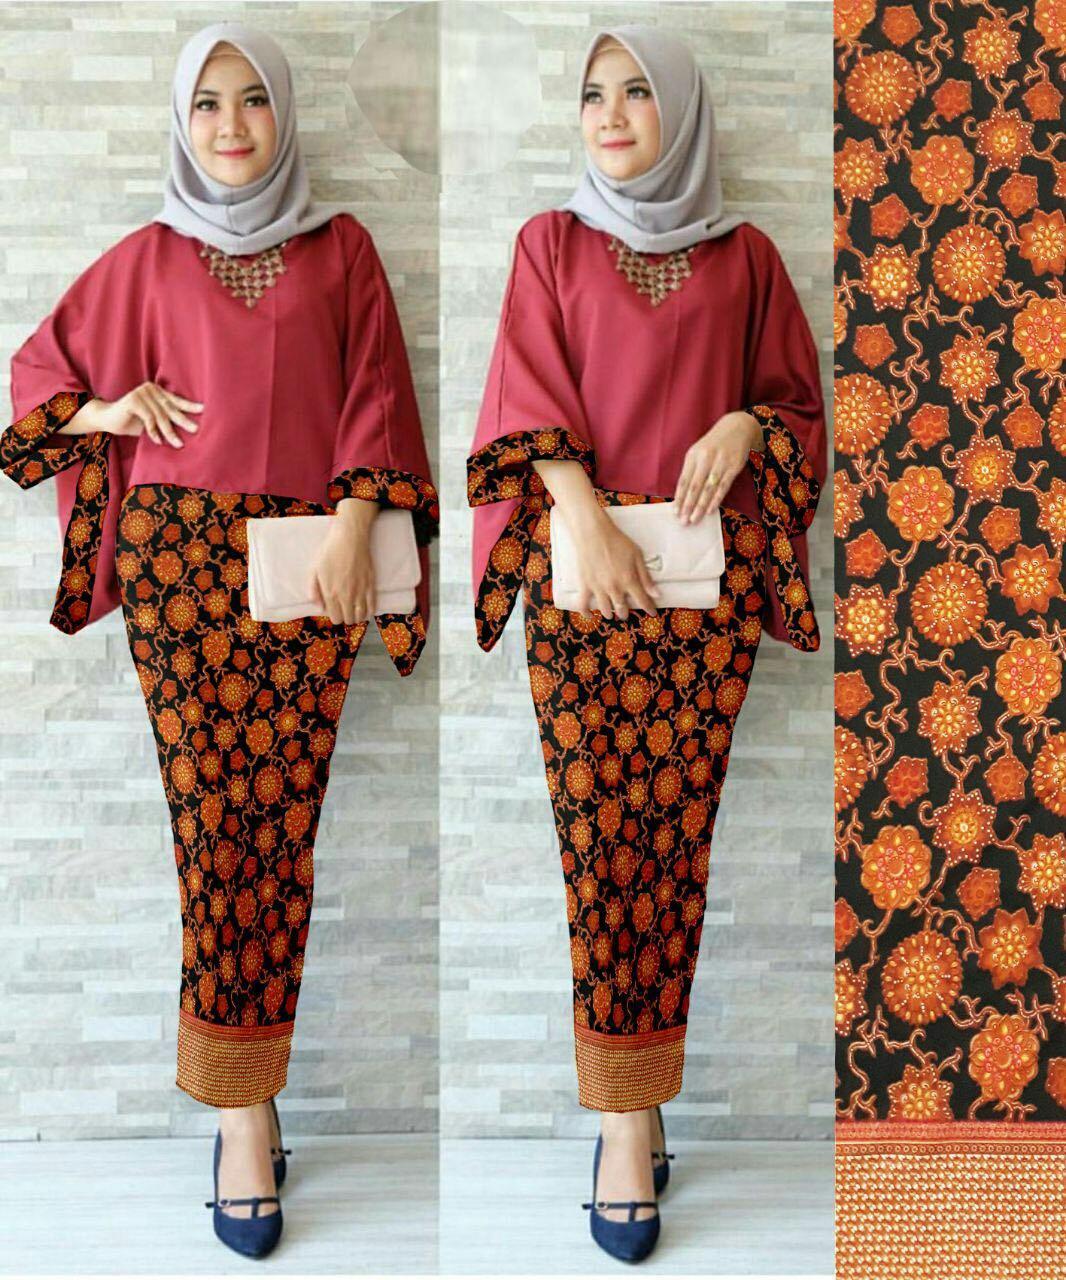 J&C Setelan 2In1 Batwing Sunflow / Atasan Batwing / Setelan Kebaya Batwing / Baju Pesta / Kebaya Muslim / Rok Panjang Batik / Rok Batik / Baju Muslim / Hijab Style